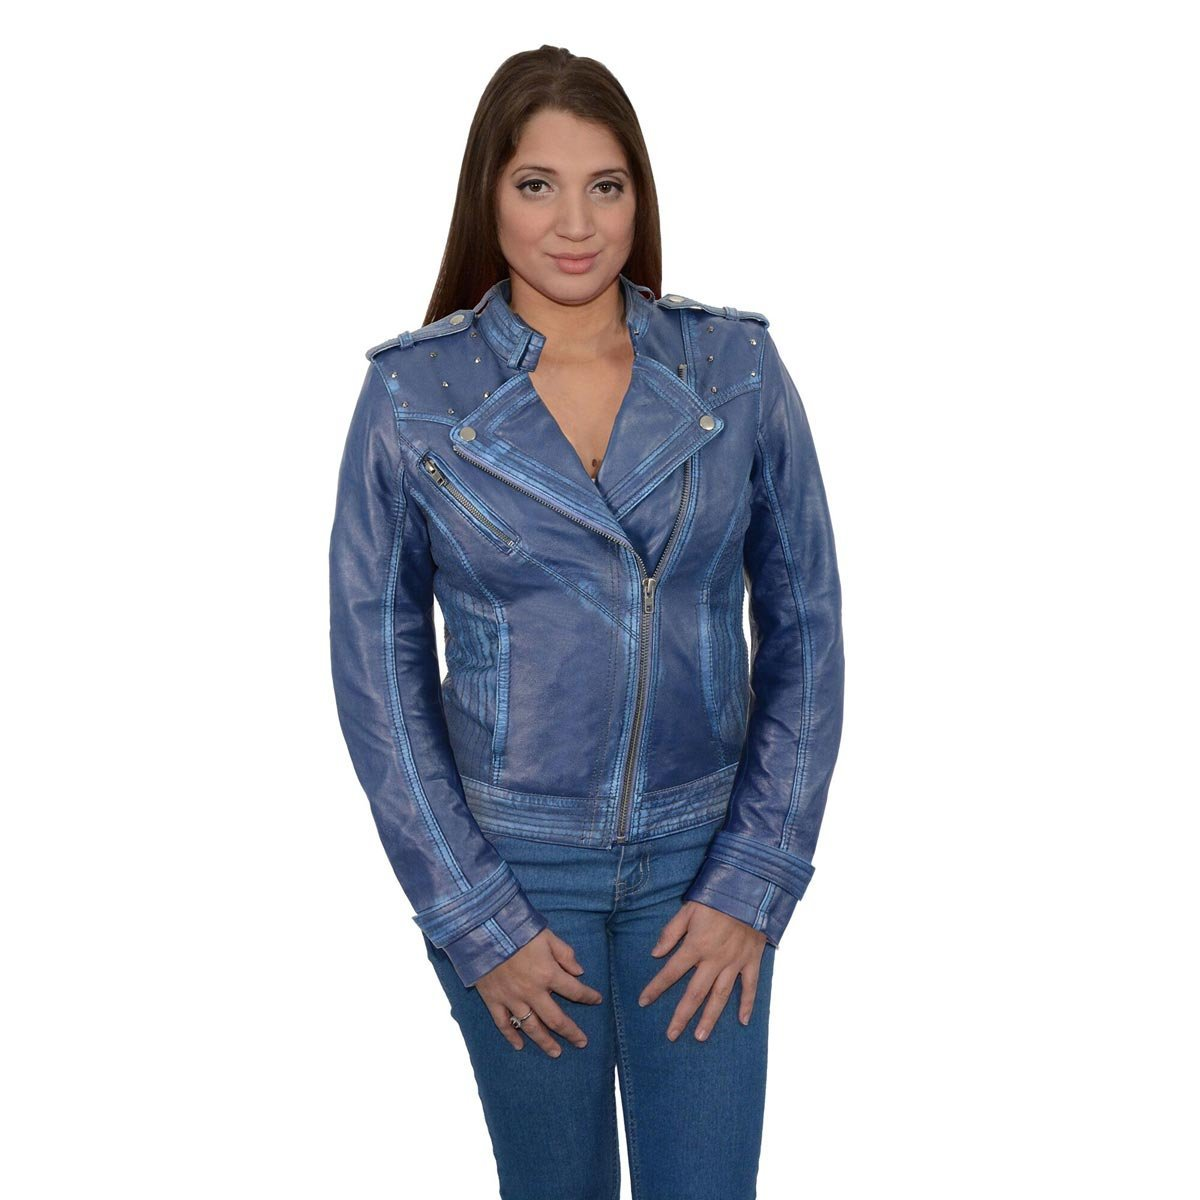 Milwaukee Leather Womens Asymmetrical Studded Royal Blue Sheepskin Jacket - 2X-Large